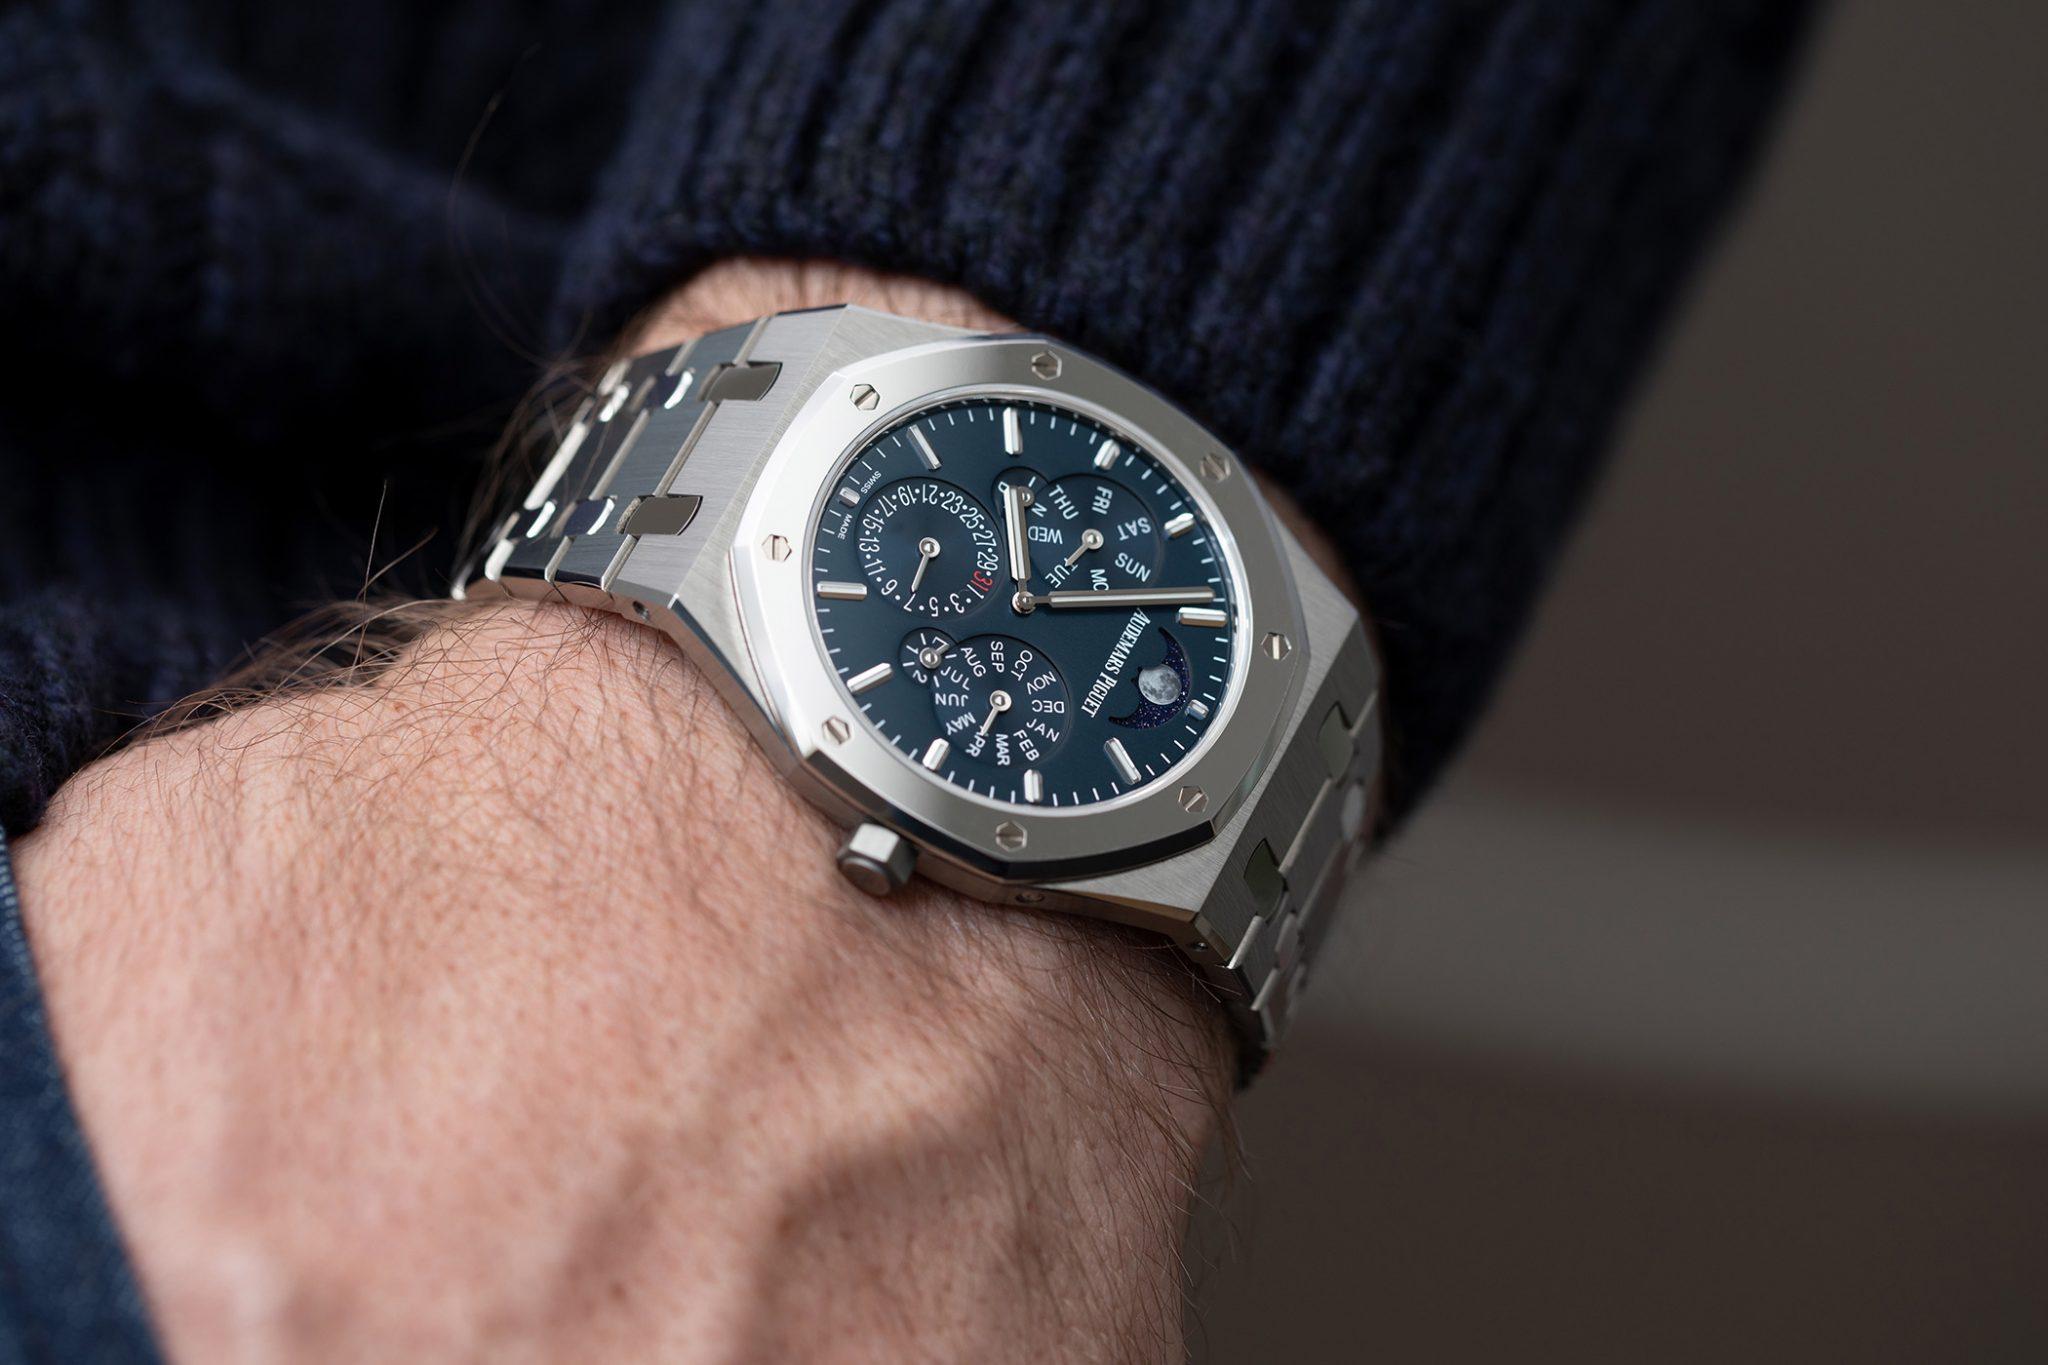 Pocketshot: The Audemars Piguet Royal Oak Selfwinding Perpetual Calendar Ultra-Thin 26586IP.OO.1240IP.01 on the wrist